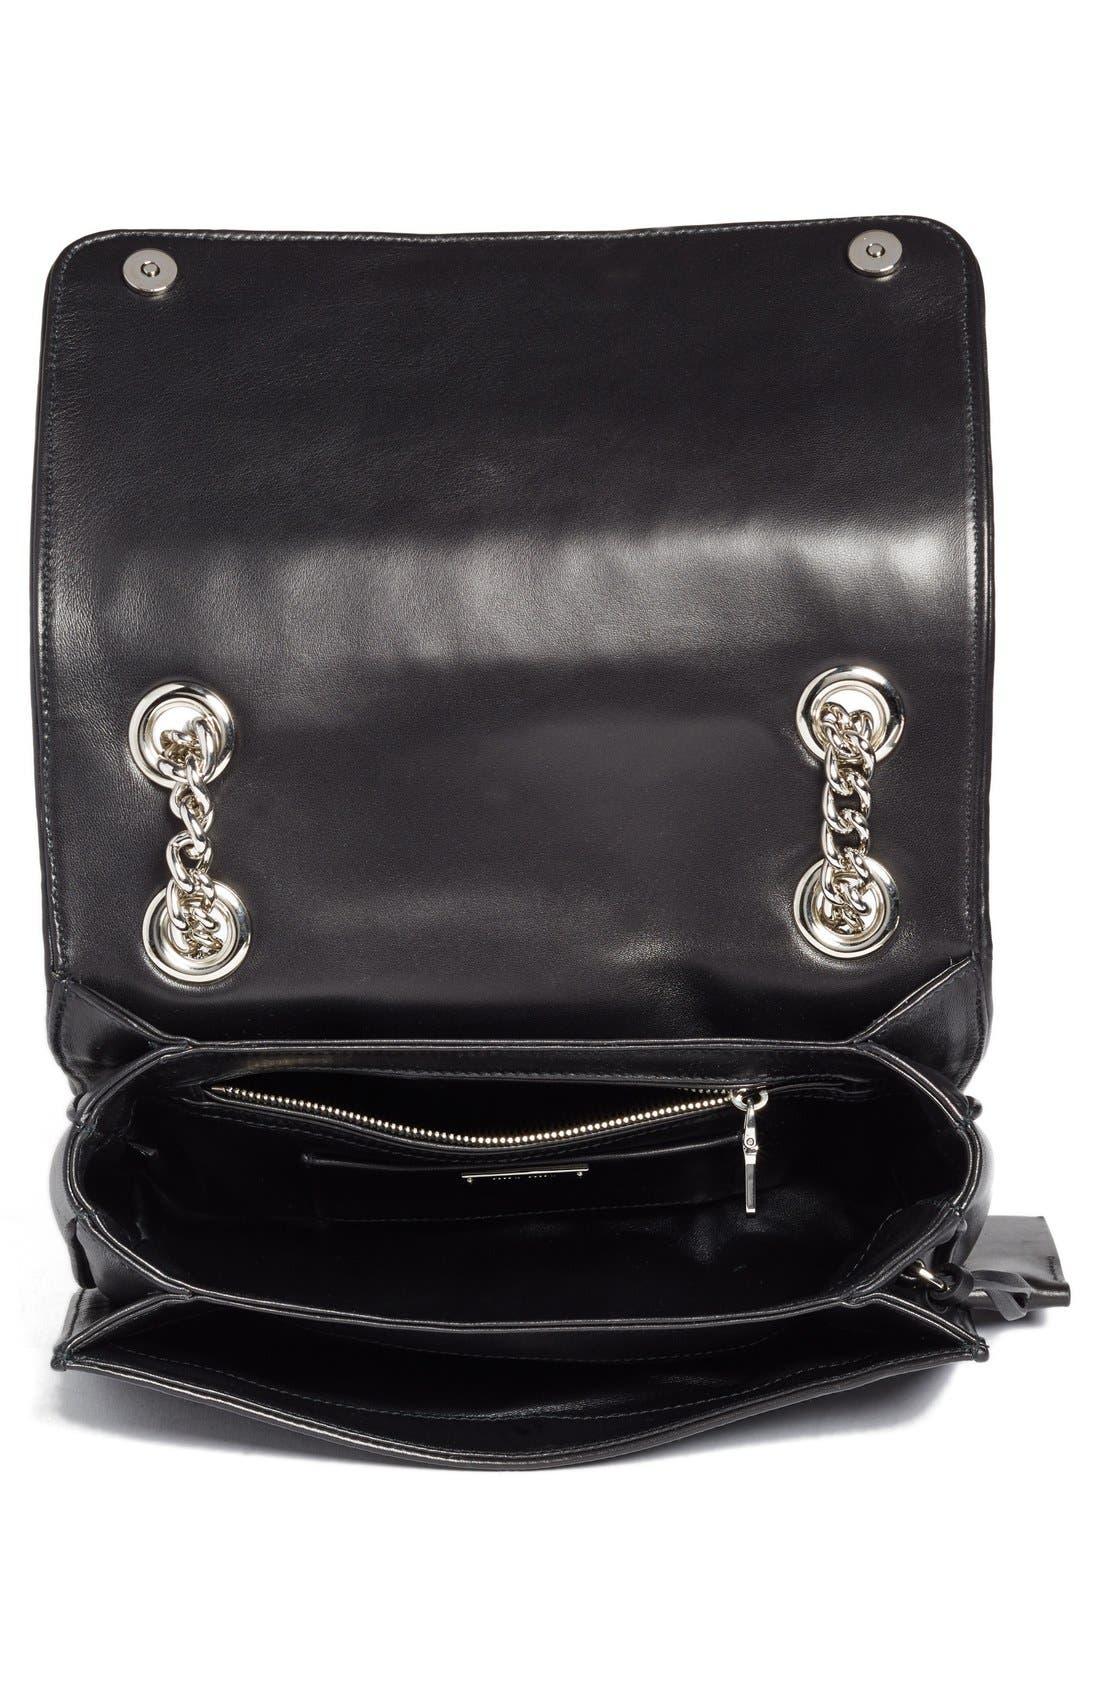 Alternate Image 3  - Miu Miu 'Club' Matelassé Leather Shoulder Bag